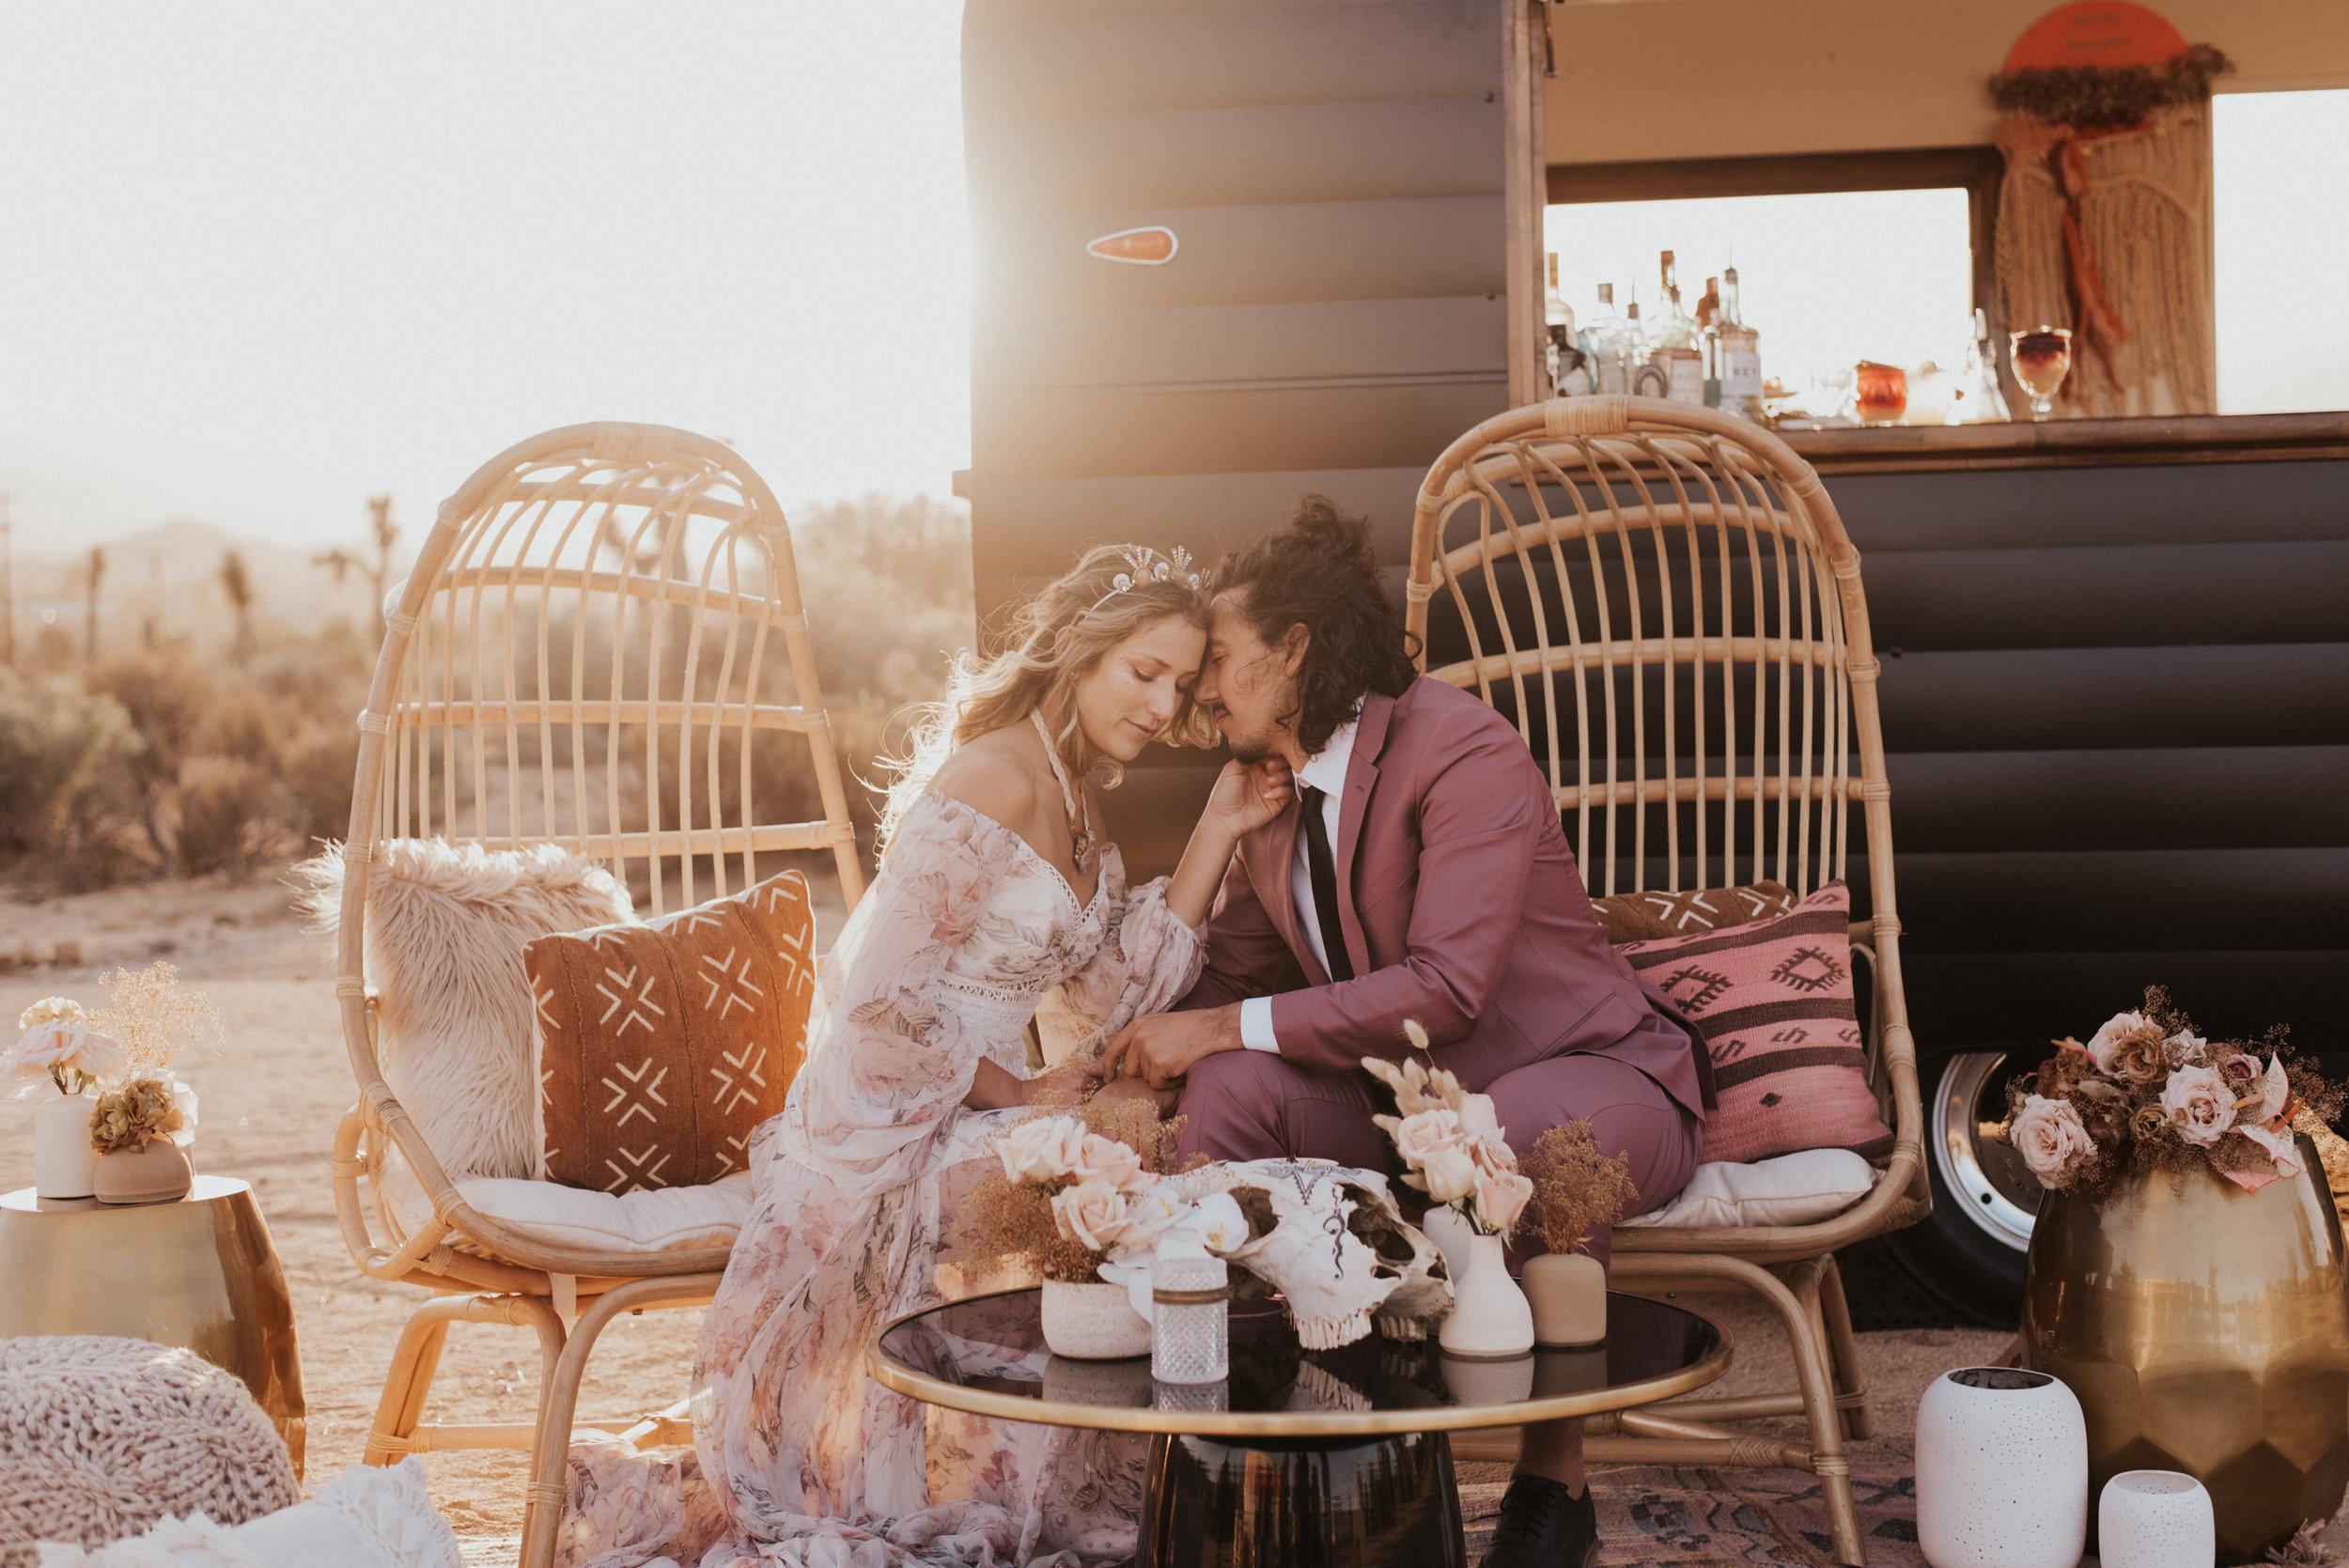 FortSt.John_photographer_TyraEPhotography_Wedding_Couple_Family_Photograhy_DawsonCreek_Elopement_Bride_Boduoir_Portraits-8335.jpg